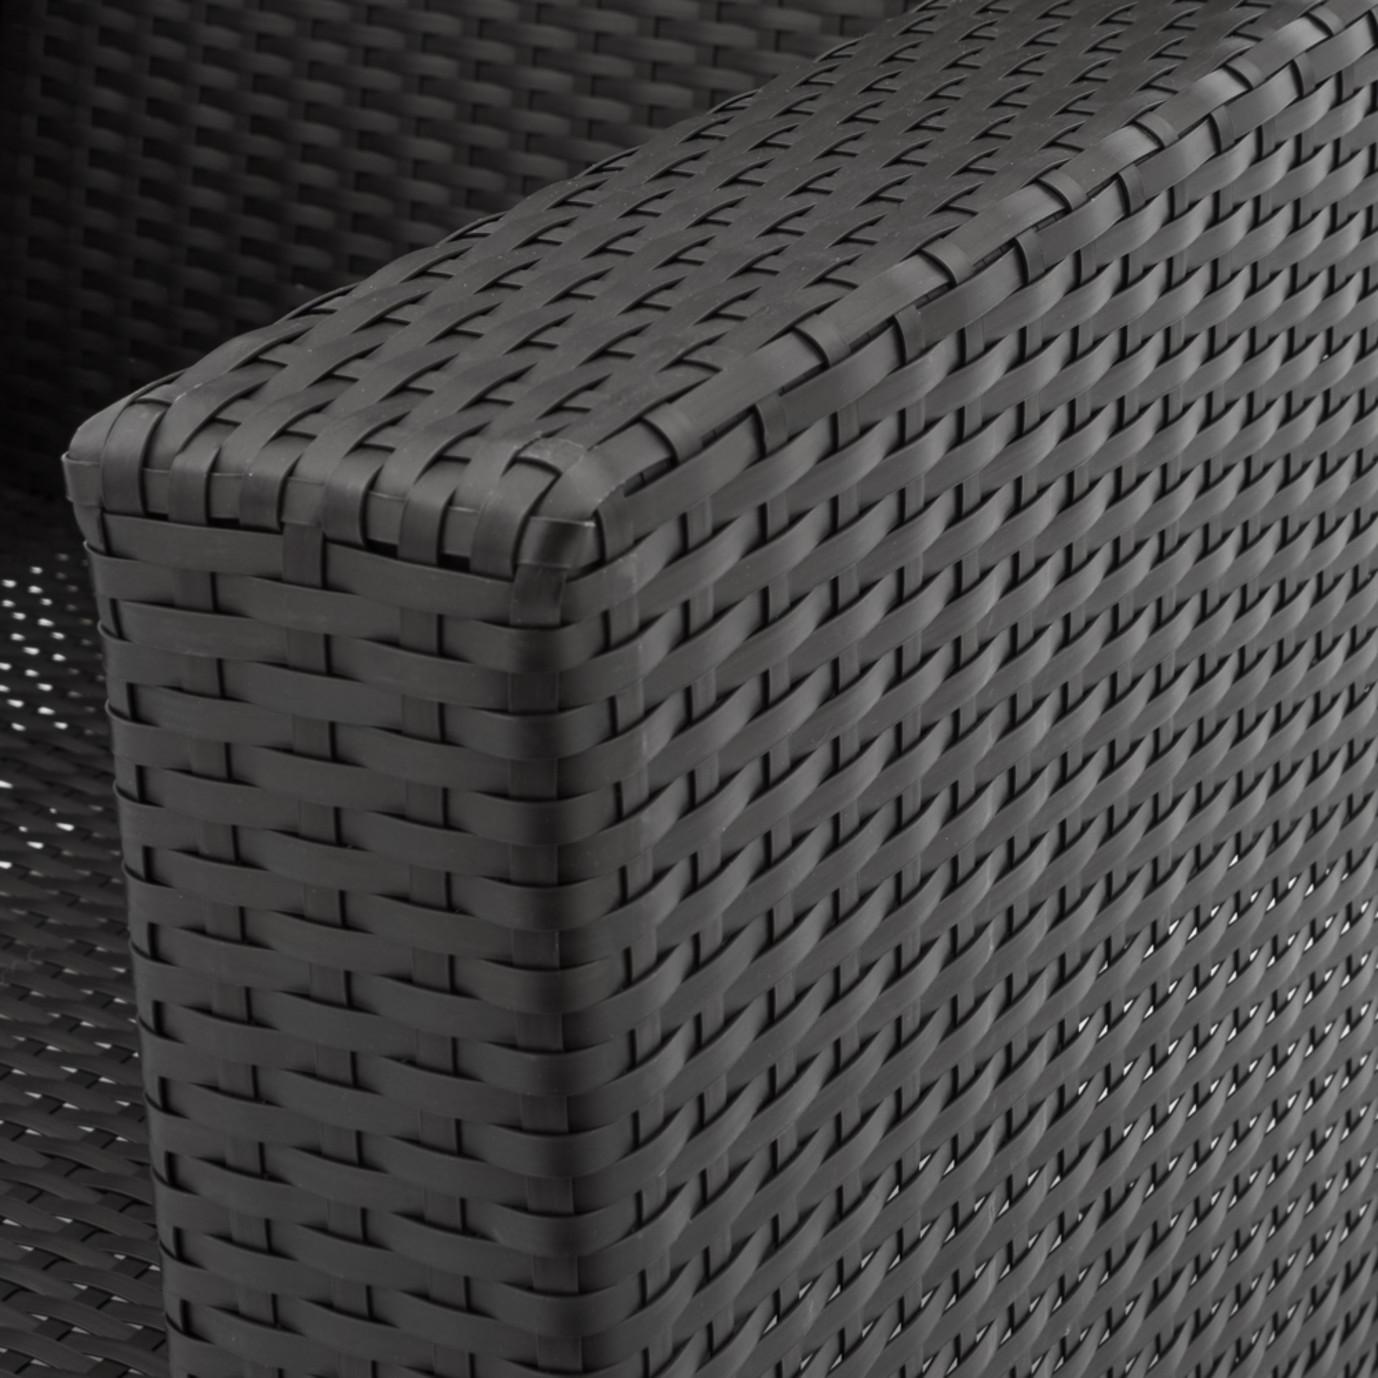 Milo™ Espresso 4pc Seating Set - Charcoal Gray